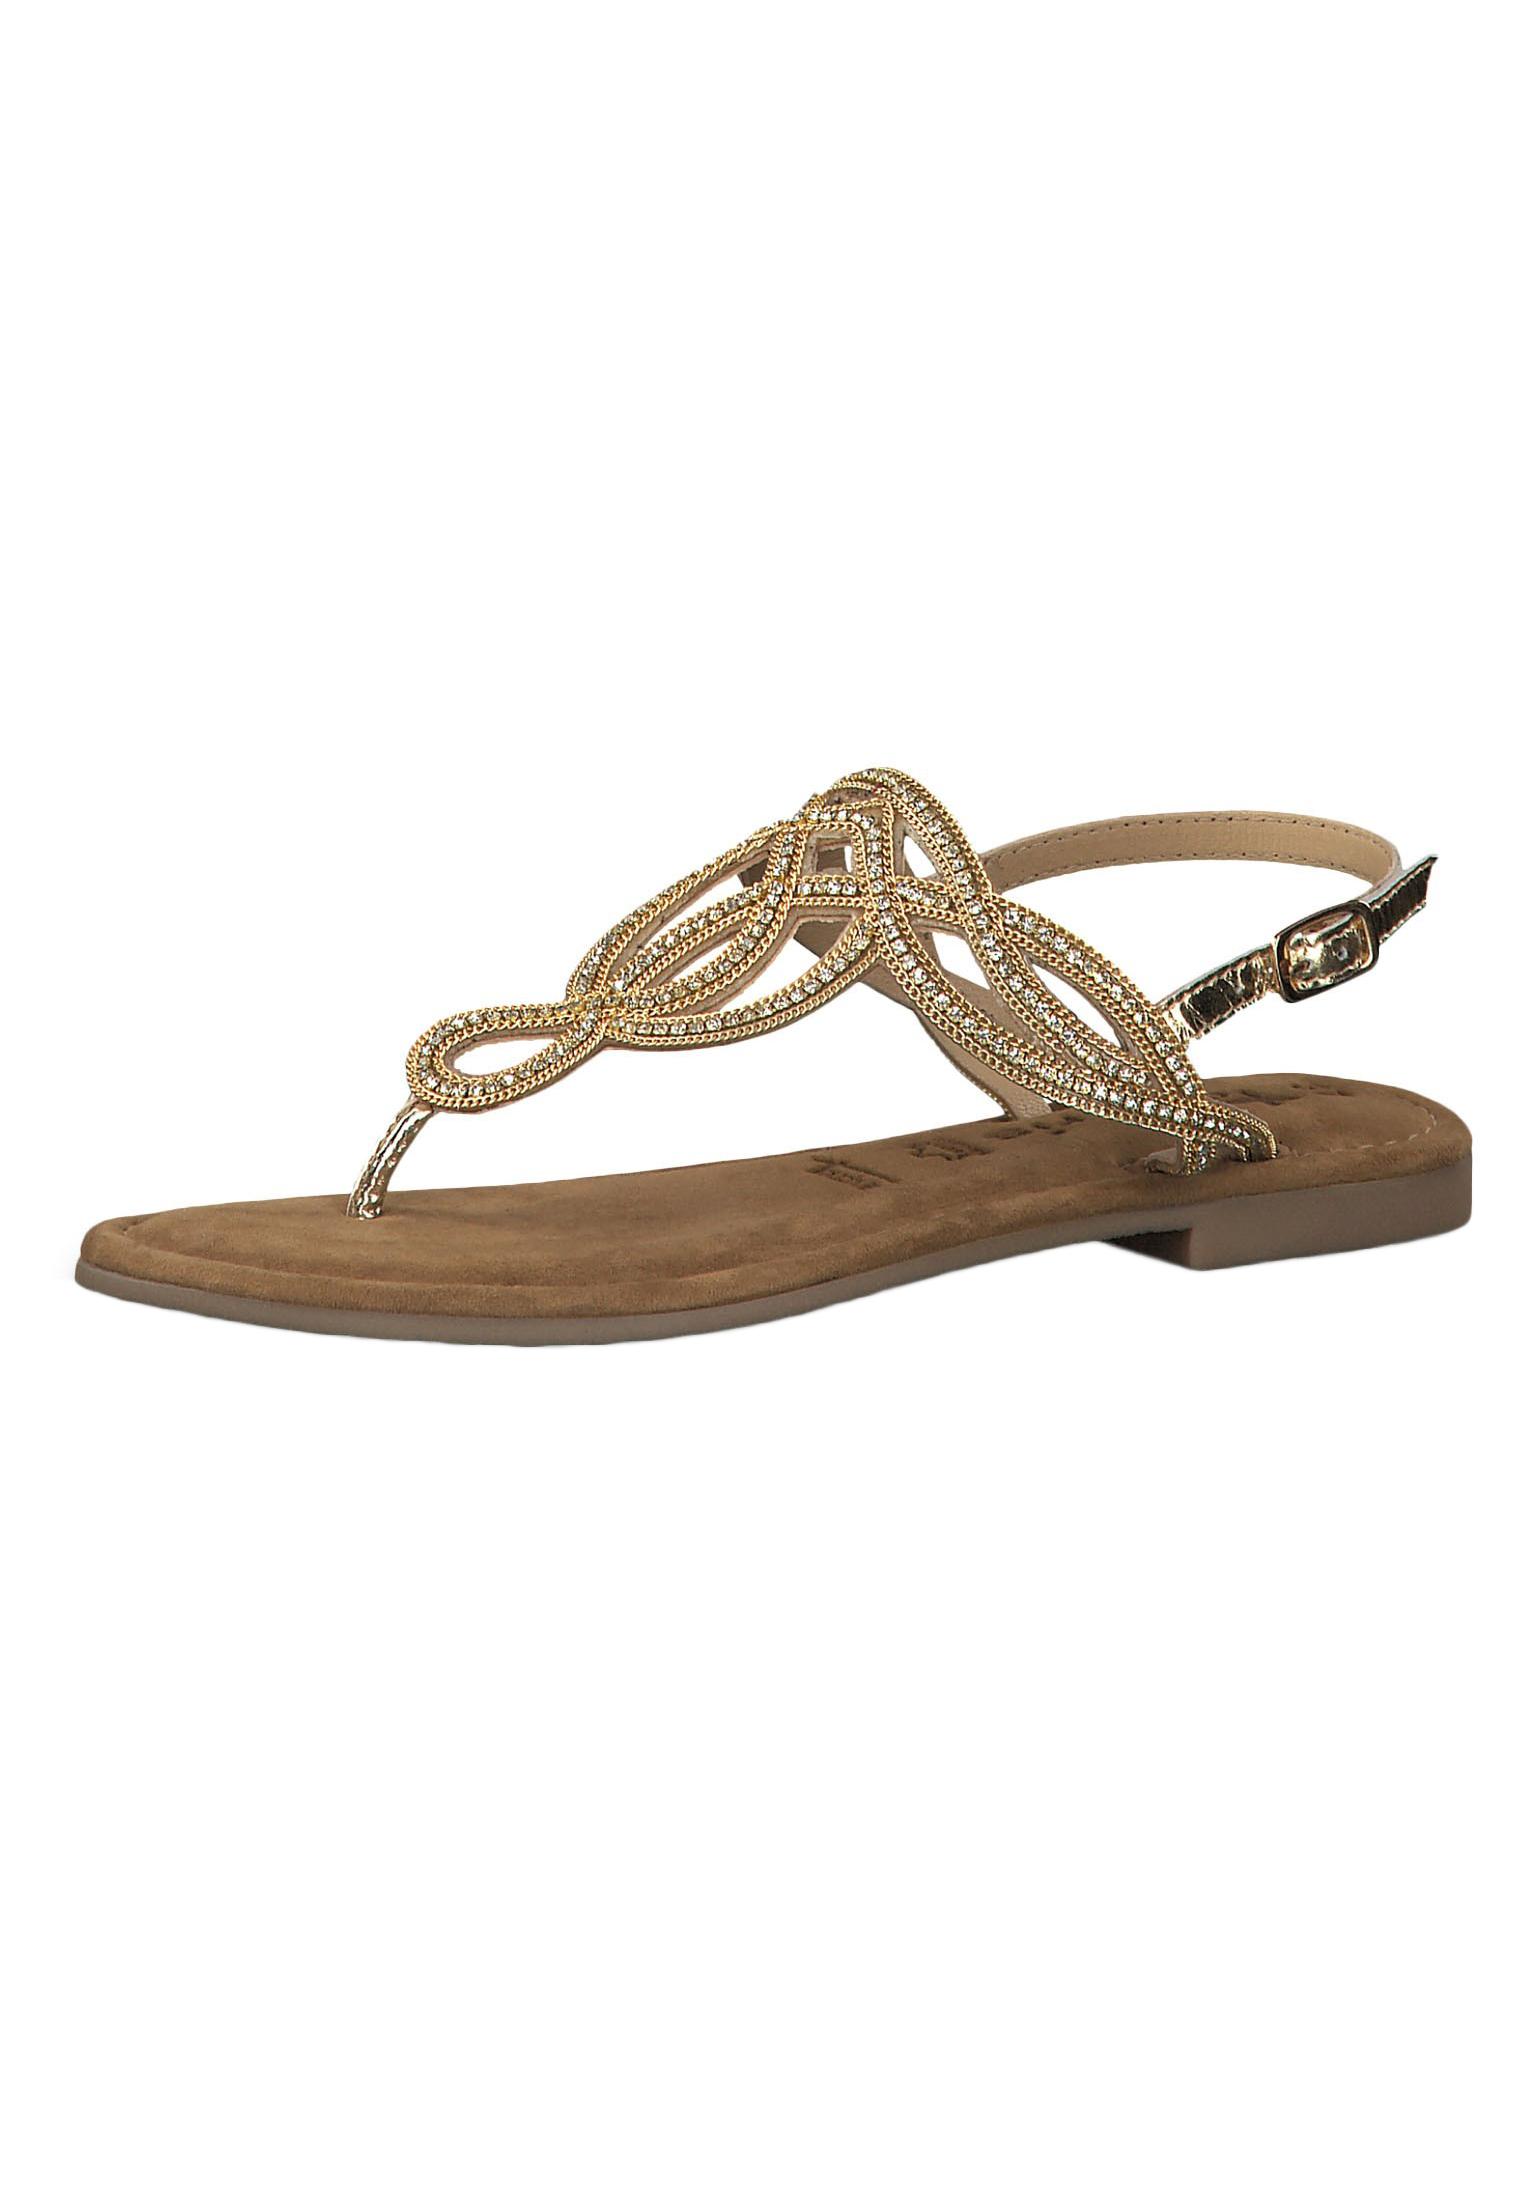 Tamaris 1 28115 22 940 Damen Gold Römer Sandaletten Sandale mit TOUCH IT Sohle